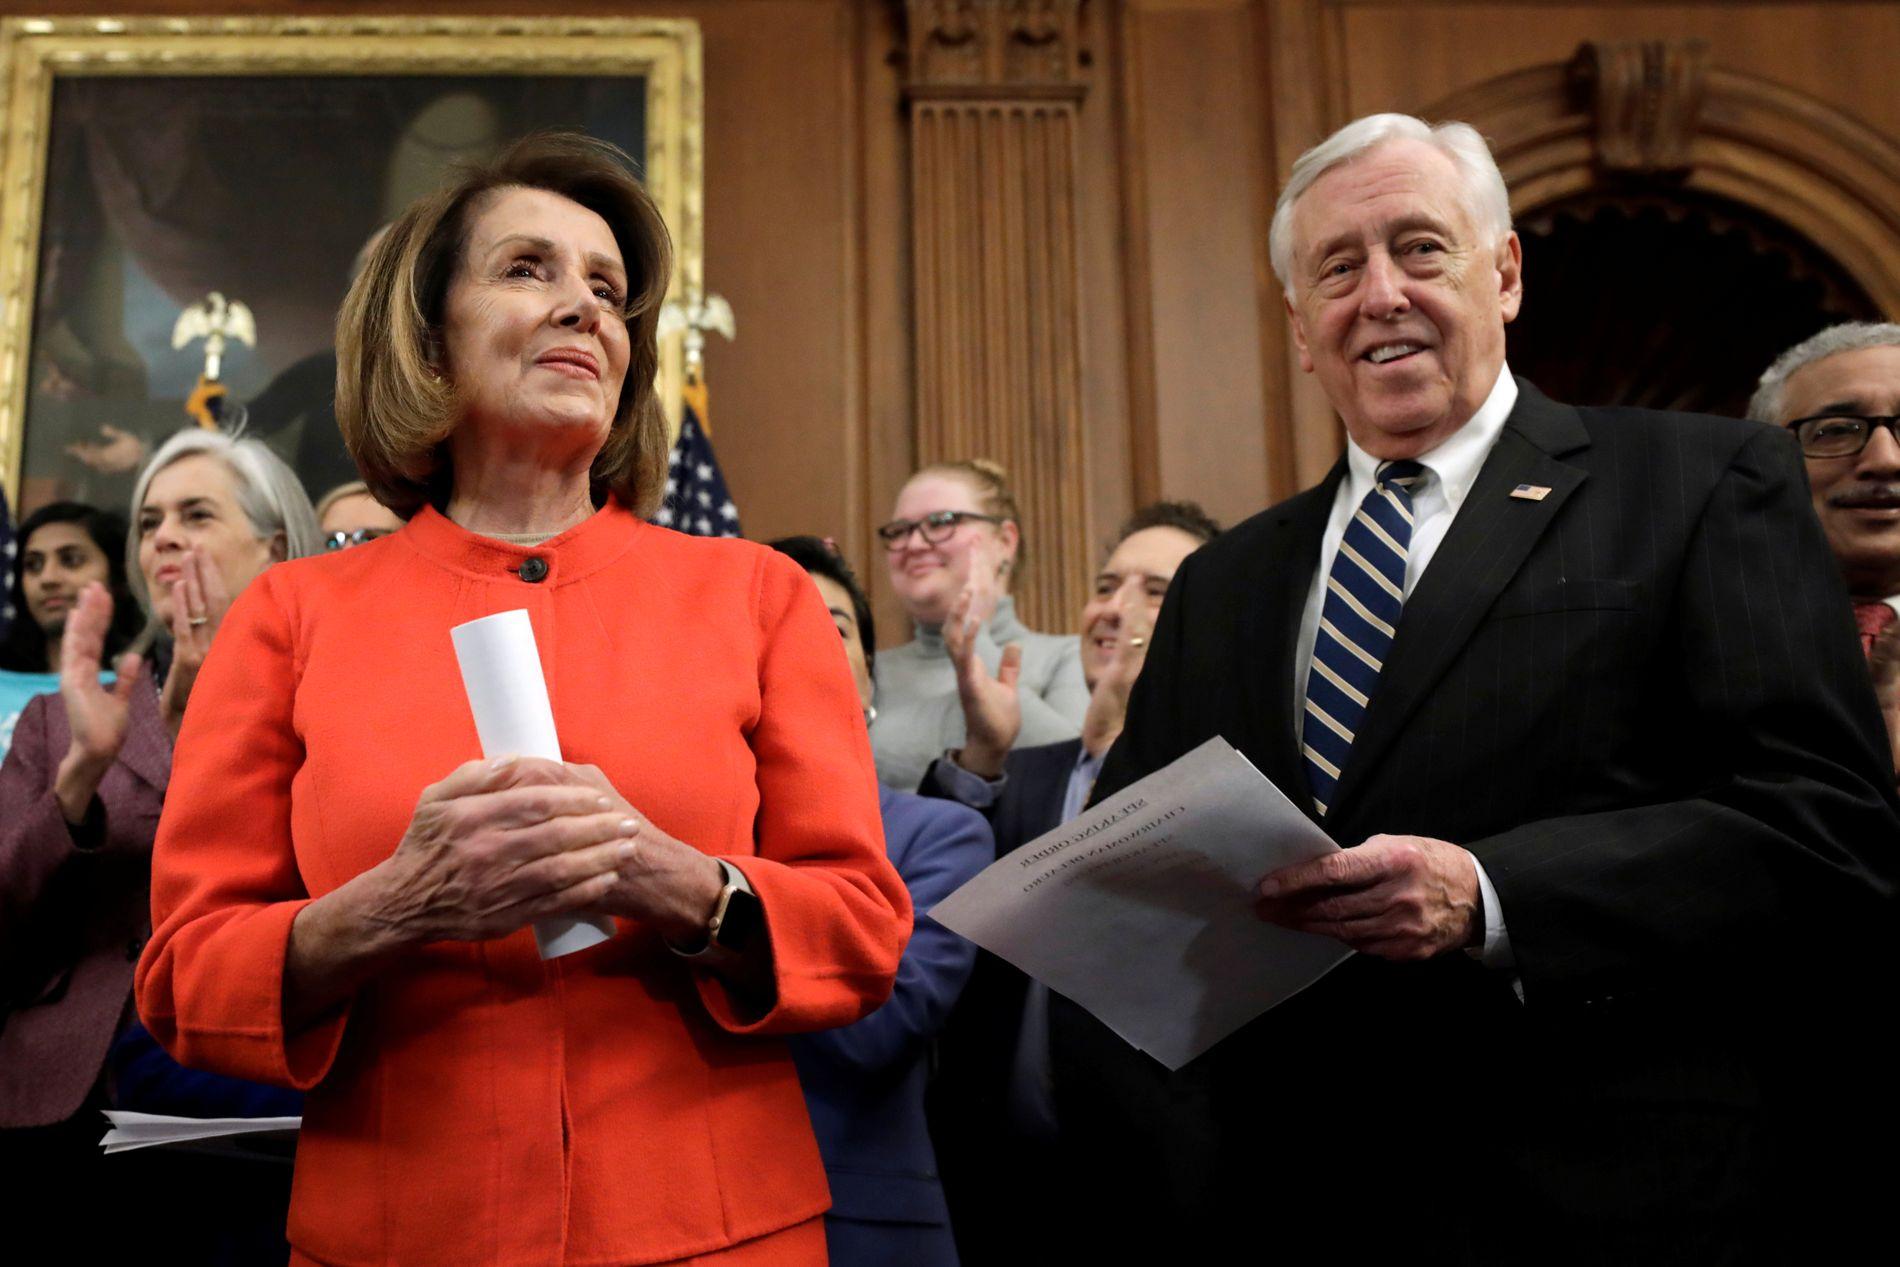 PARTITOPPER: Demokratene Nancy Pelosi og Steny Hoyer